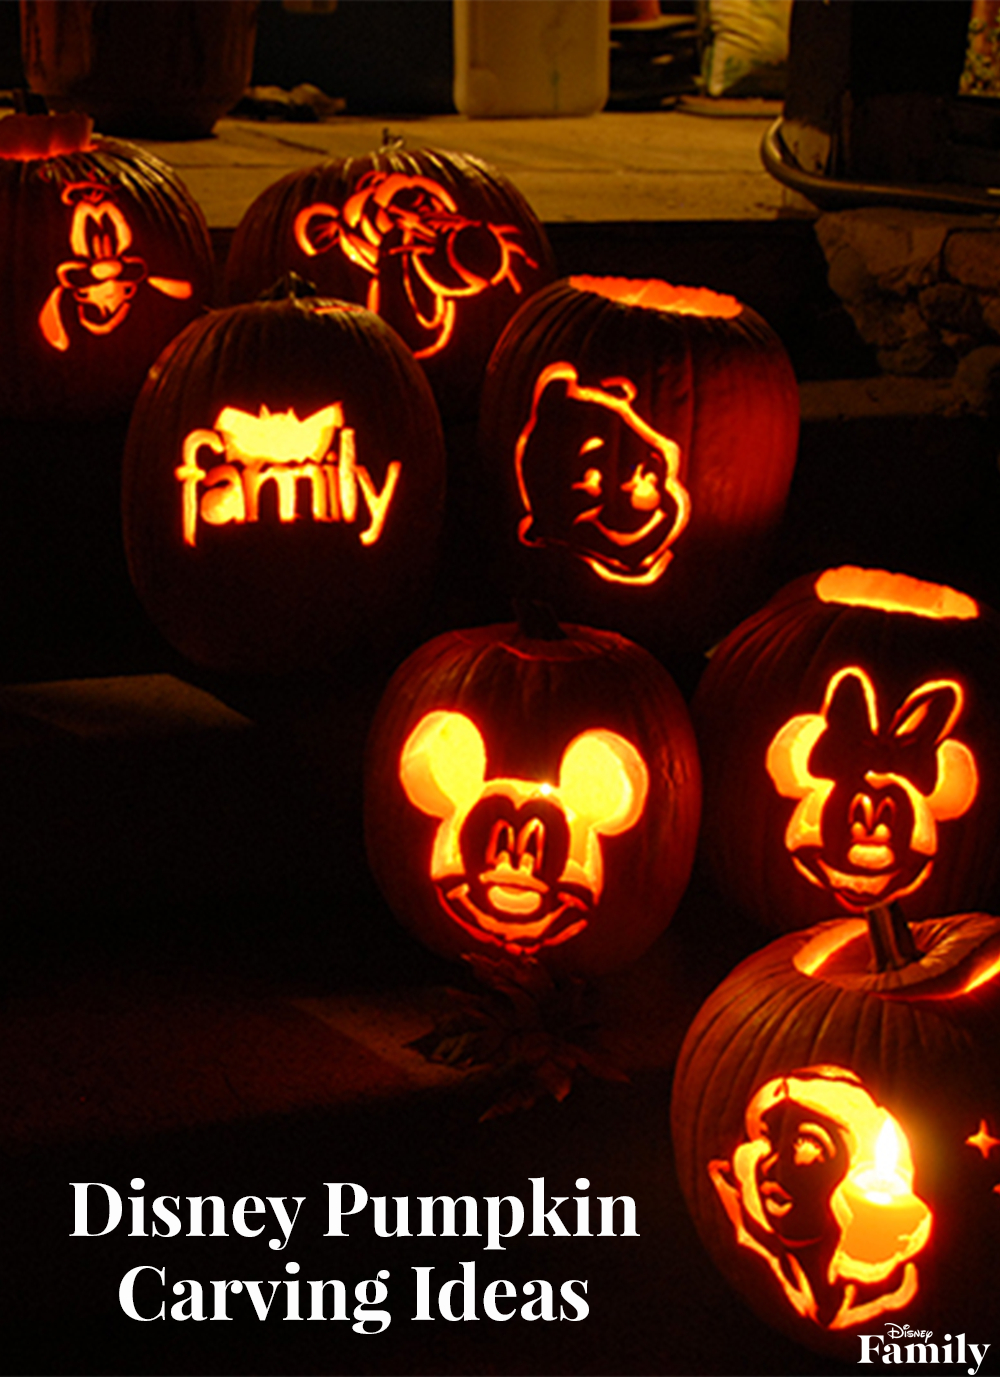 Disney Pumpkin Carving Ideas   Disney Family - Free Pumpkin Carving Patterns Disney Printable